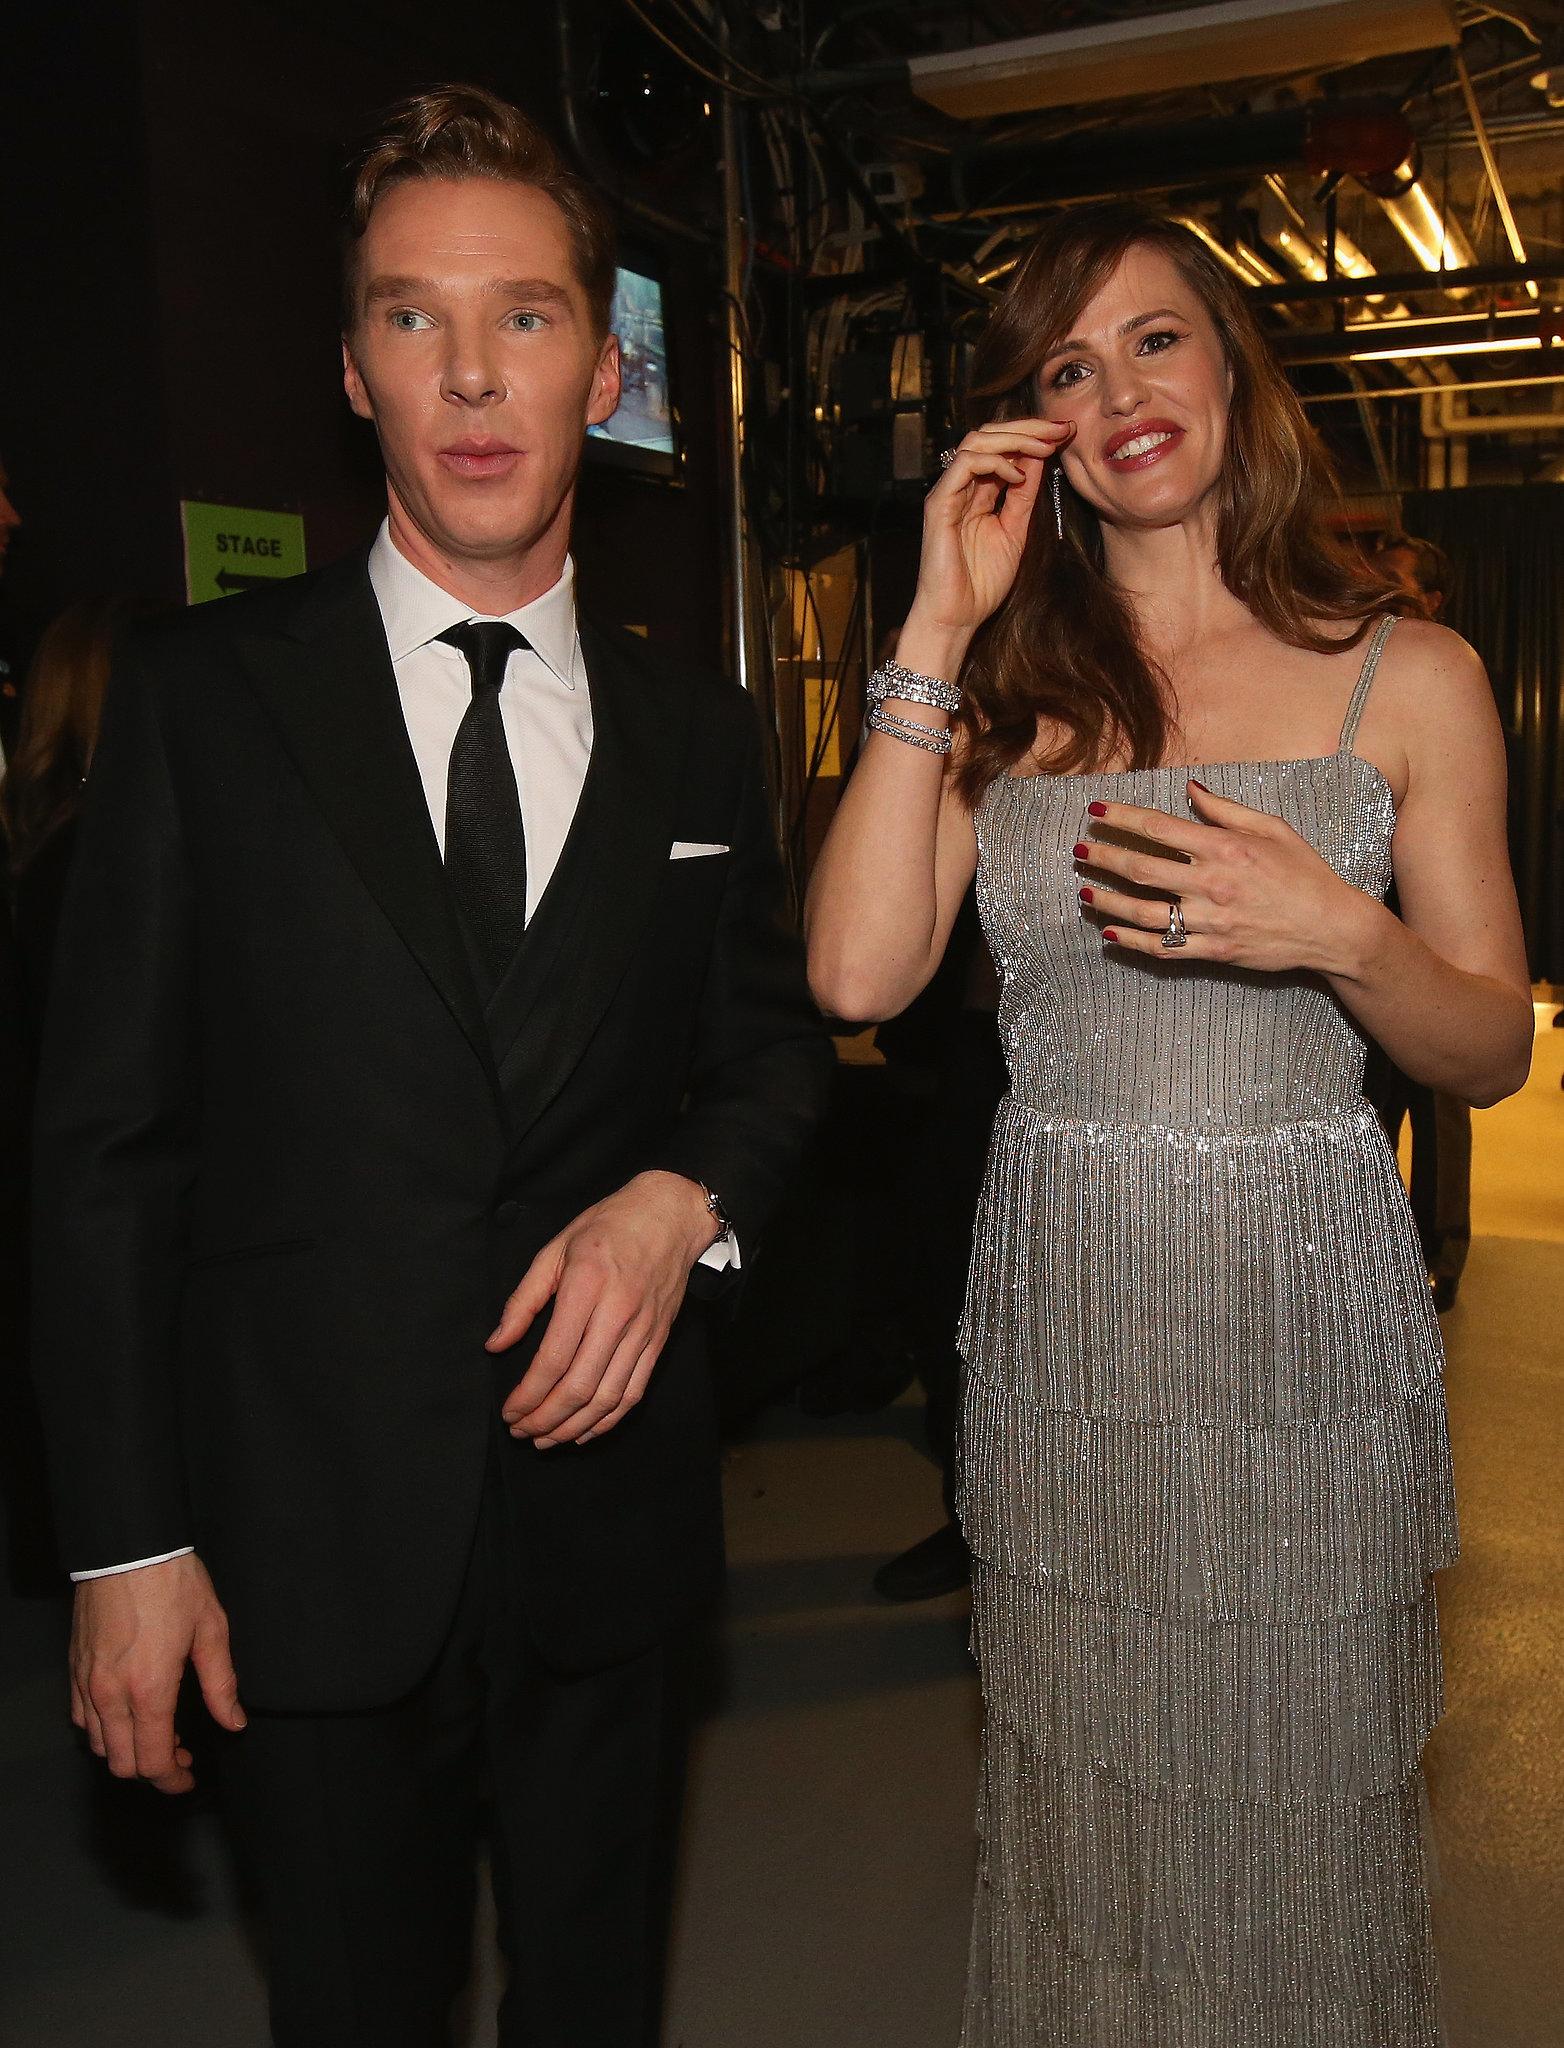 Benedict Cumberbatch and Jennifer Garner linked up backstage.